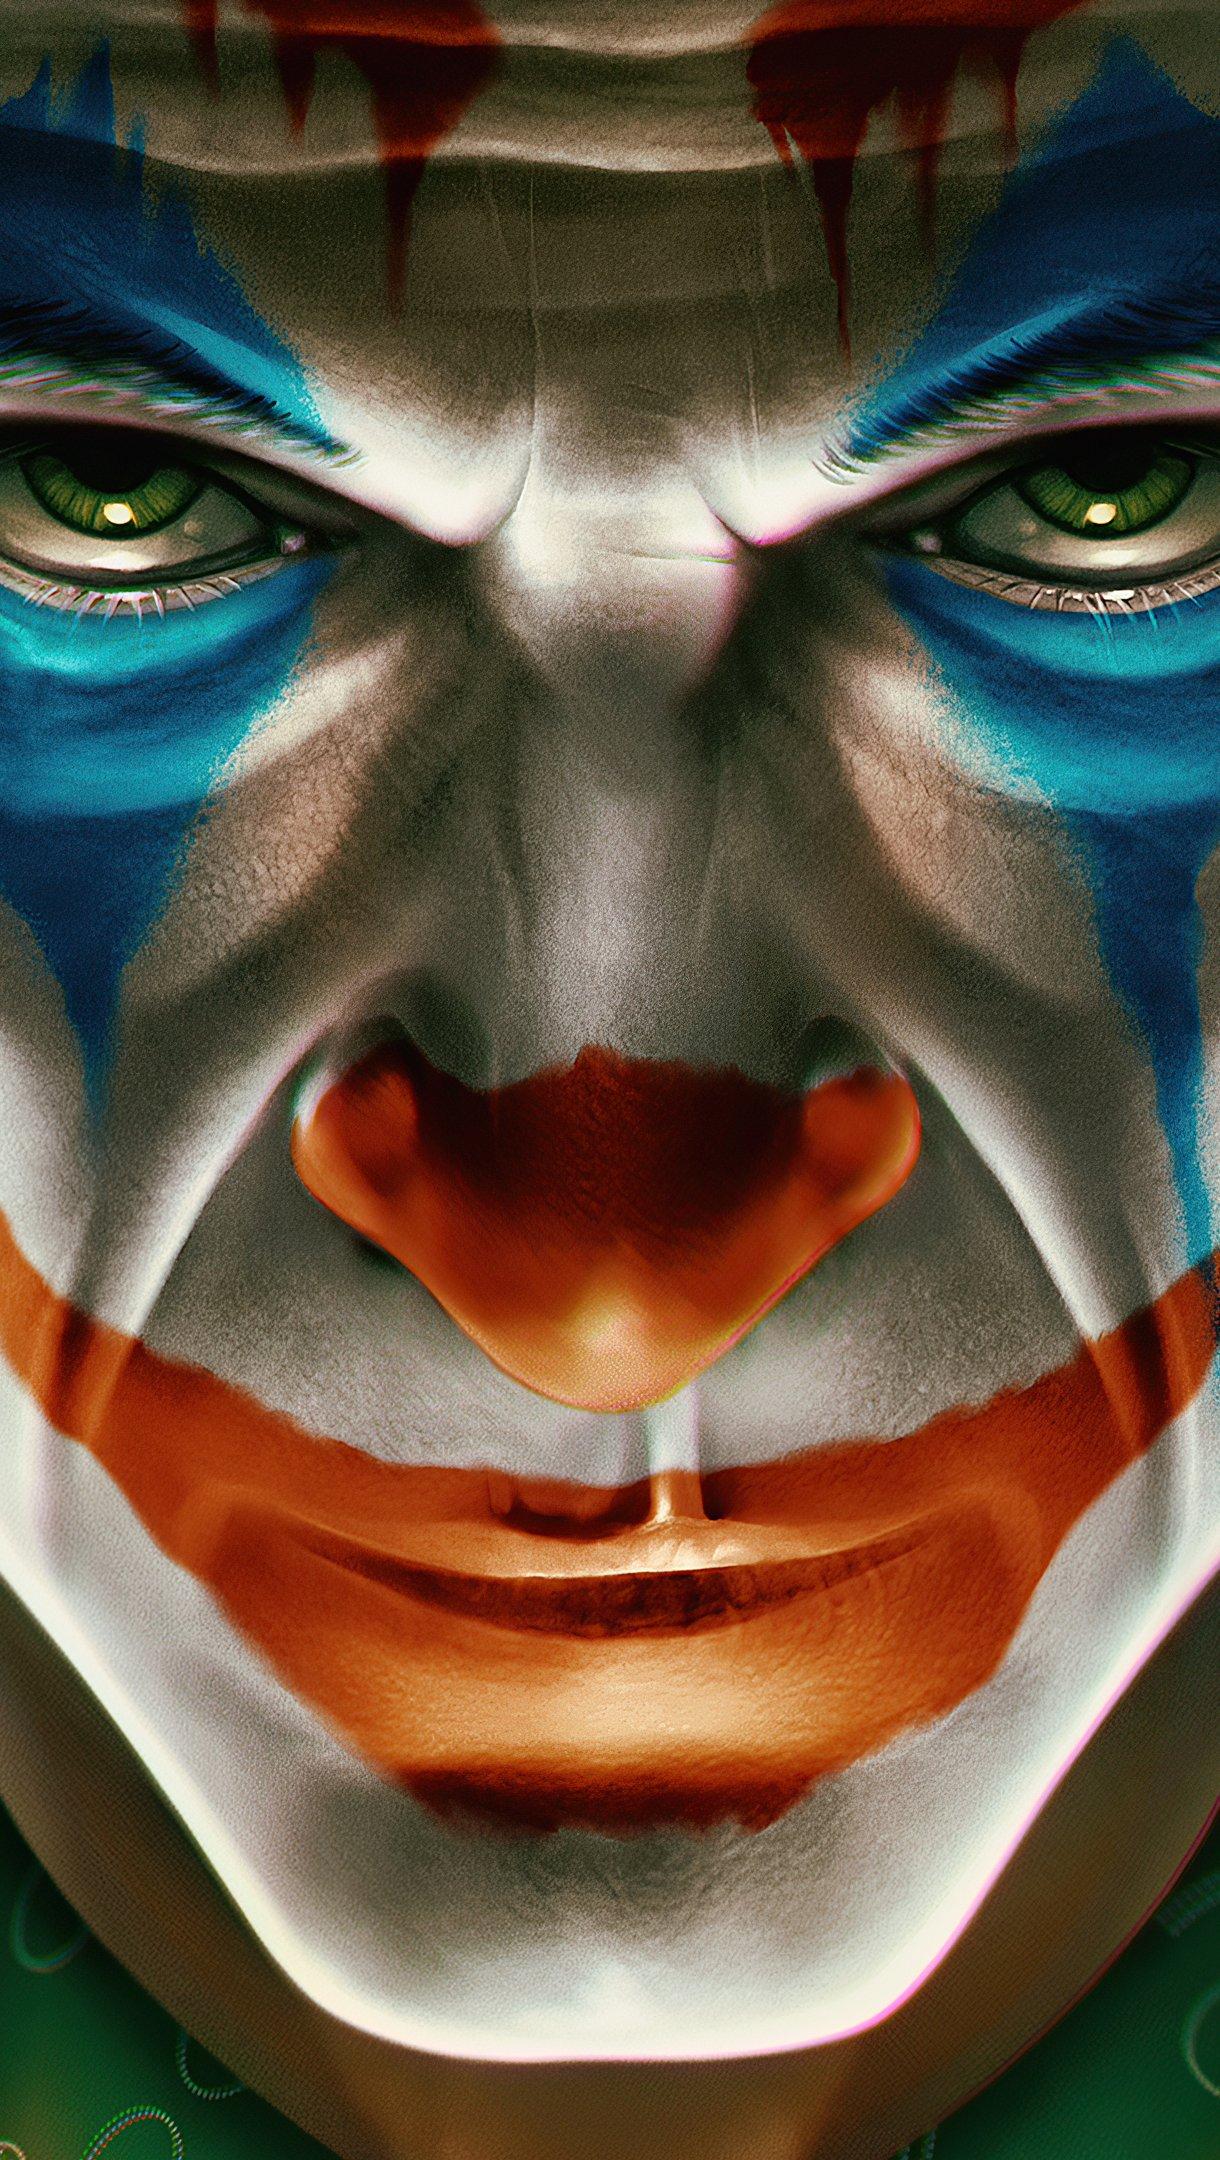 Wallpaper Joker's face upset Vertical